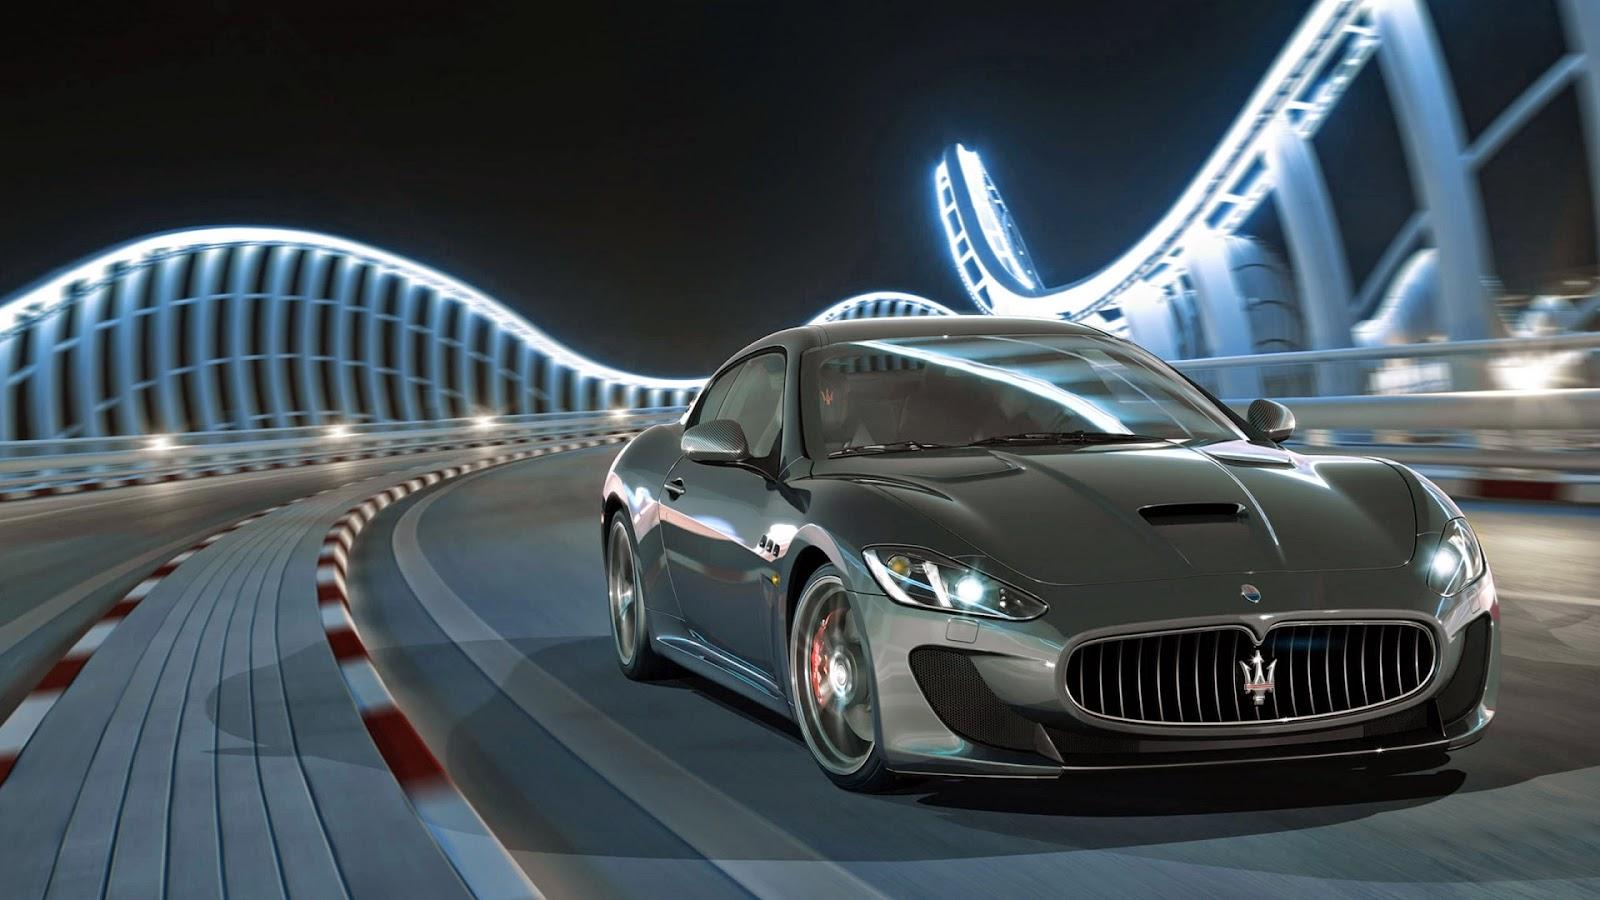 car wallpapers 2014, iphone car, fast cool cars, sports cars, bumblebee cars, bugatti cars, desktop s, honda cars s, 3d black cars s (4)